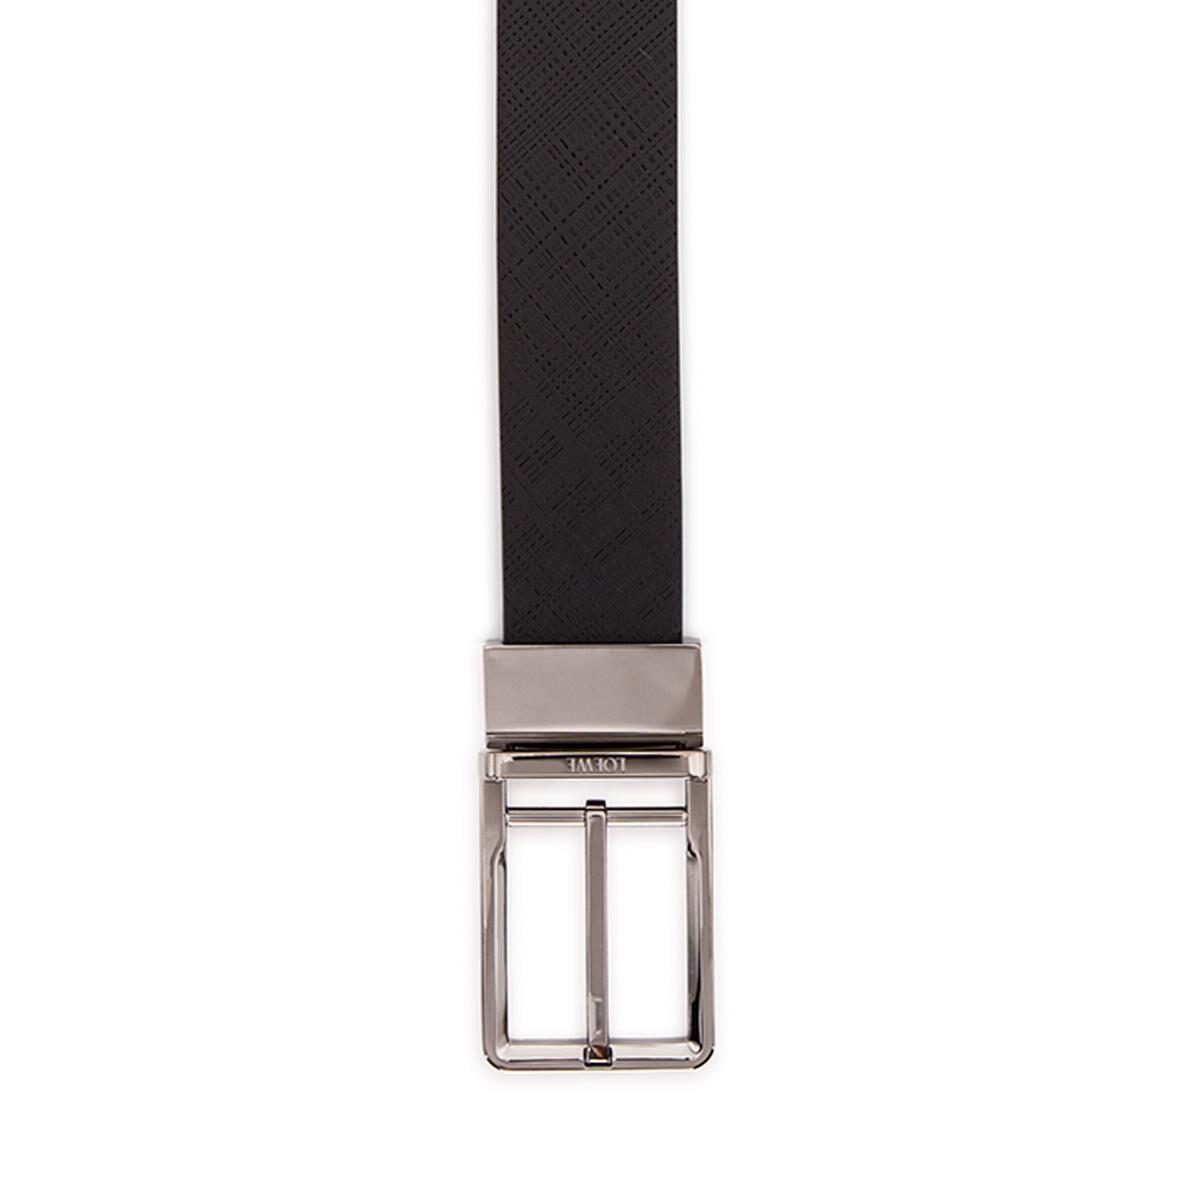 LOEWE Cinturon  Formal 3.2Cm Adj/Rev Negro/Rutenio all